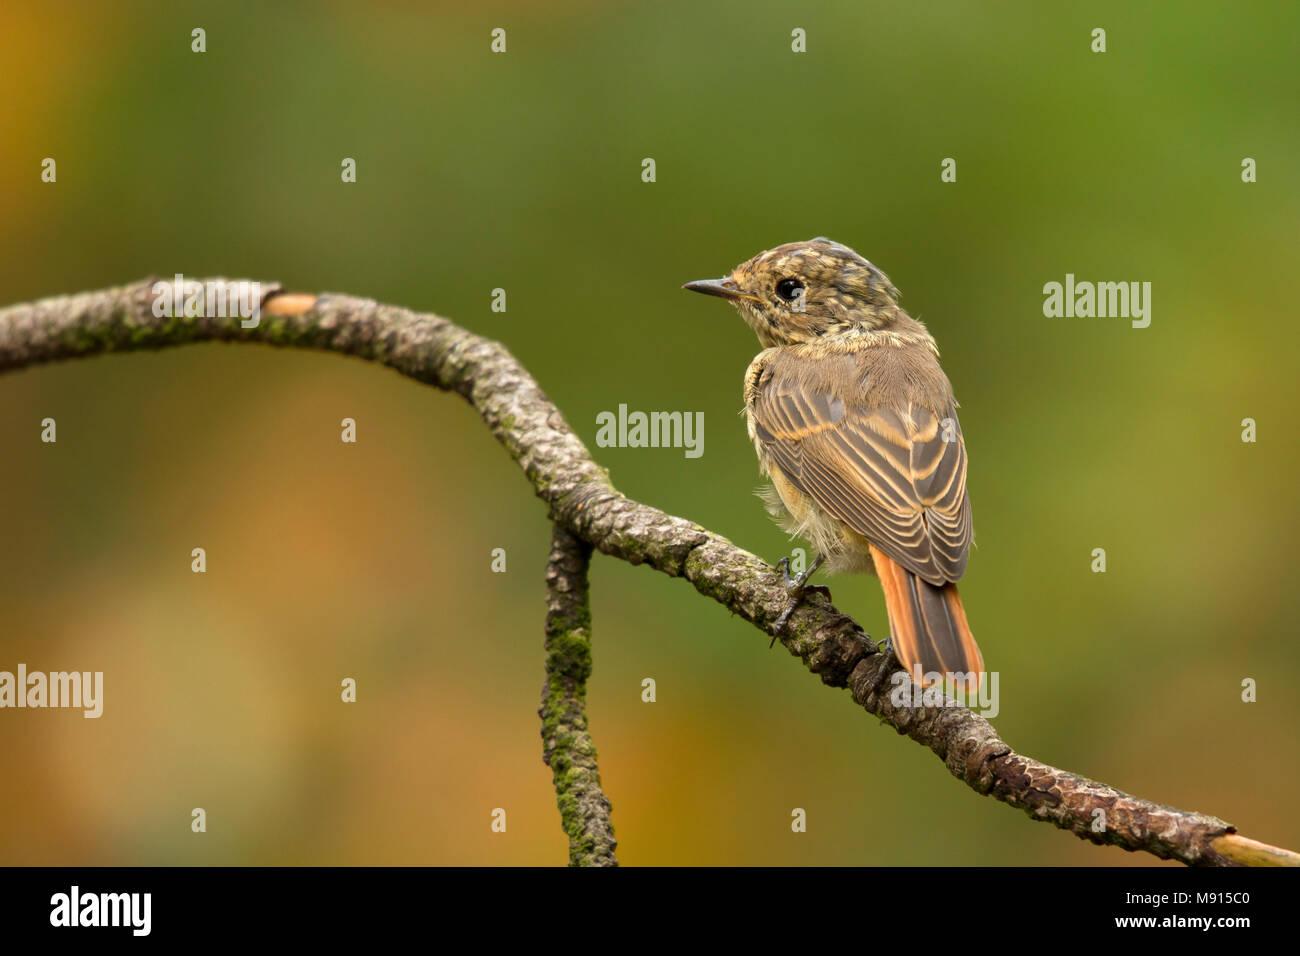 gekraagde roodstaart zittend op tak; Common redstart sitting on pearch; - Stock Image